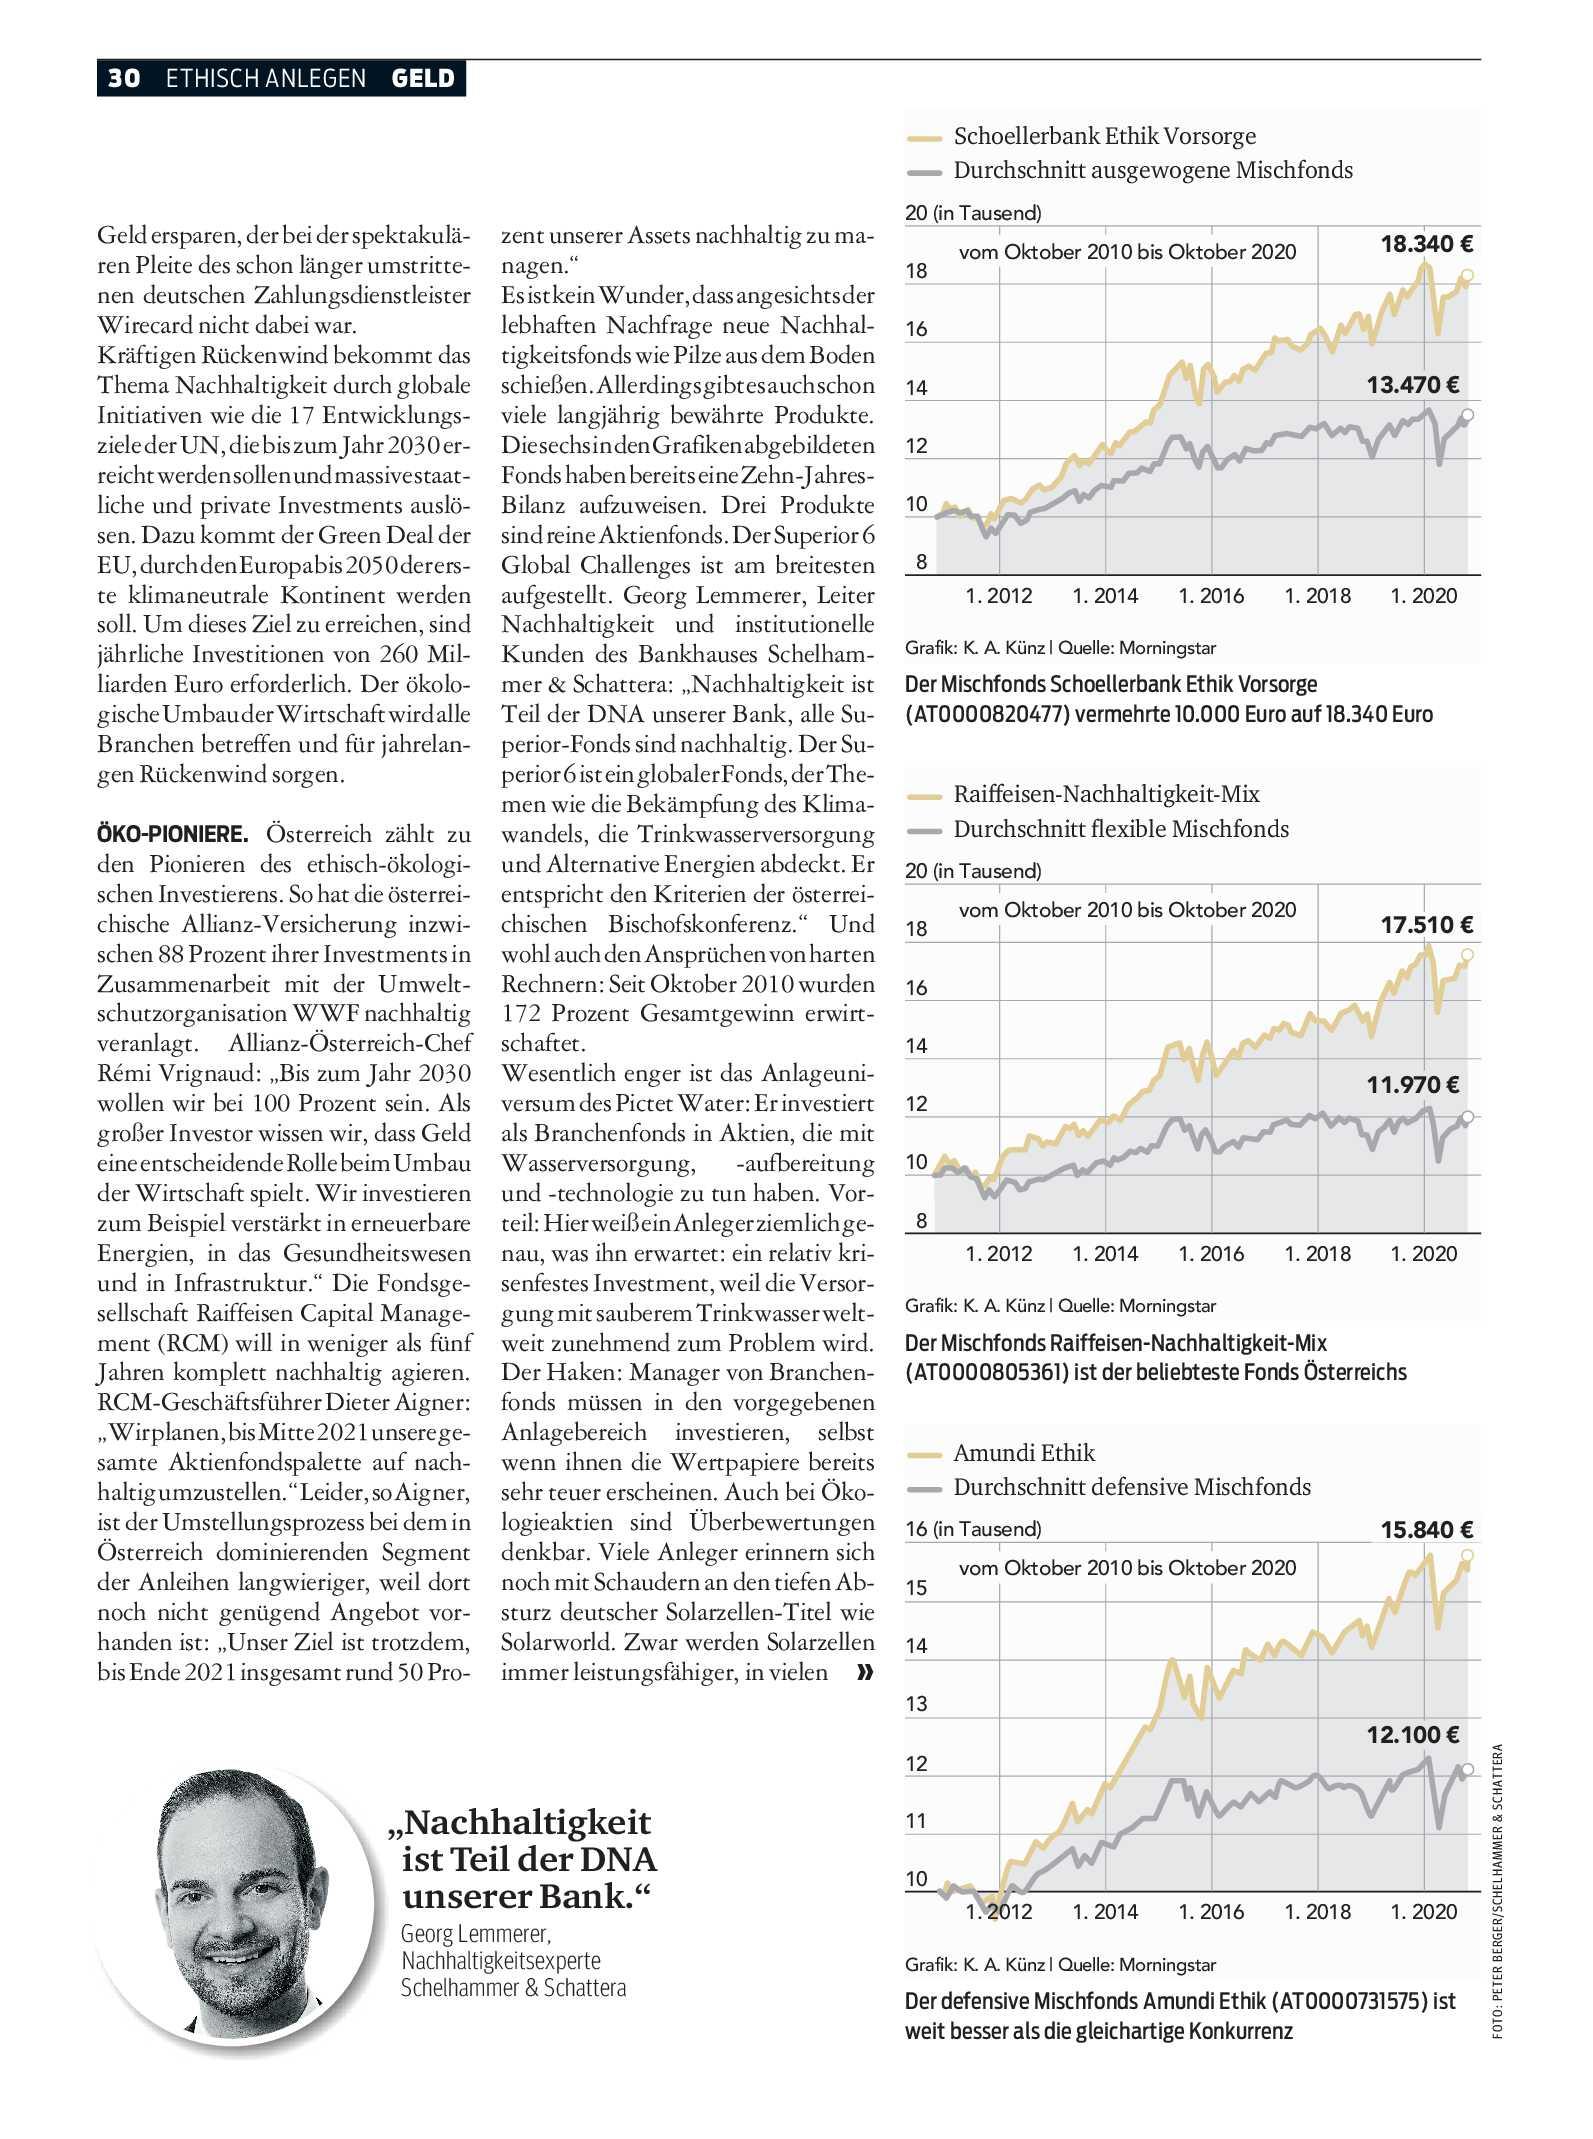 public/epaper/imported/20201118/kurier/magazin/magazin_20201118_030.jpg